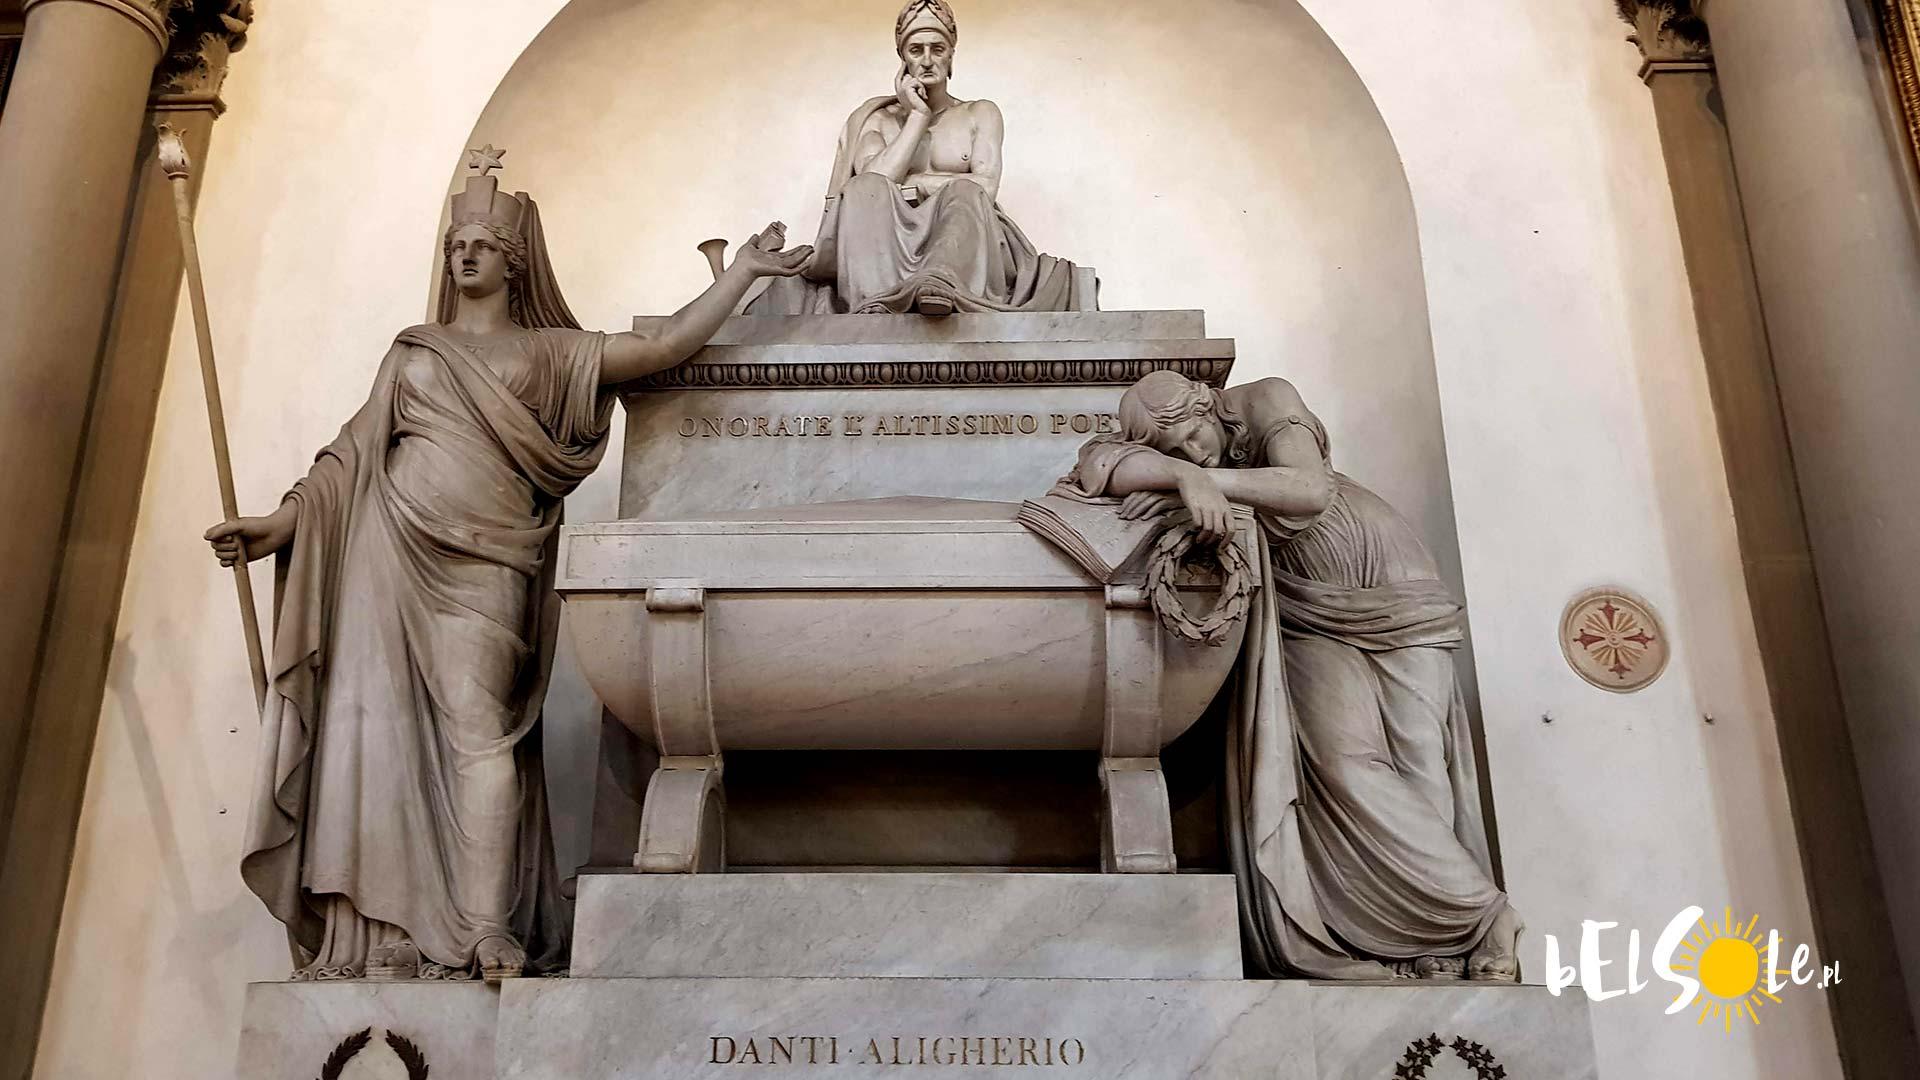 Grób Dante Alighieri